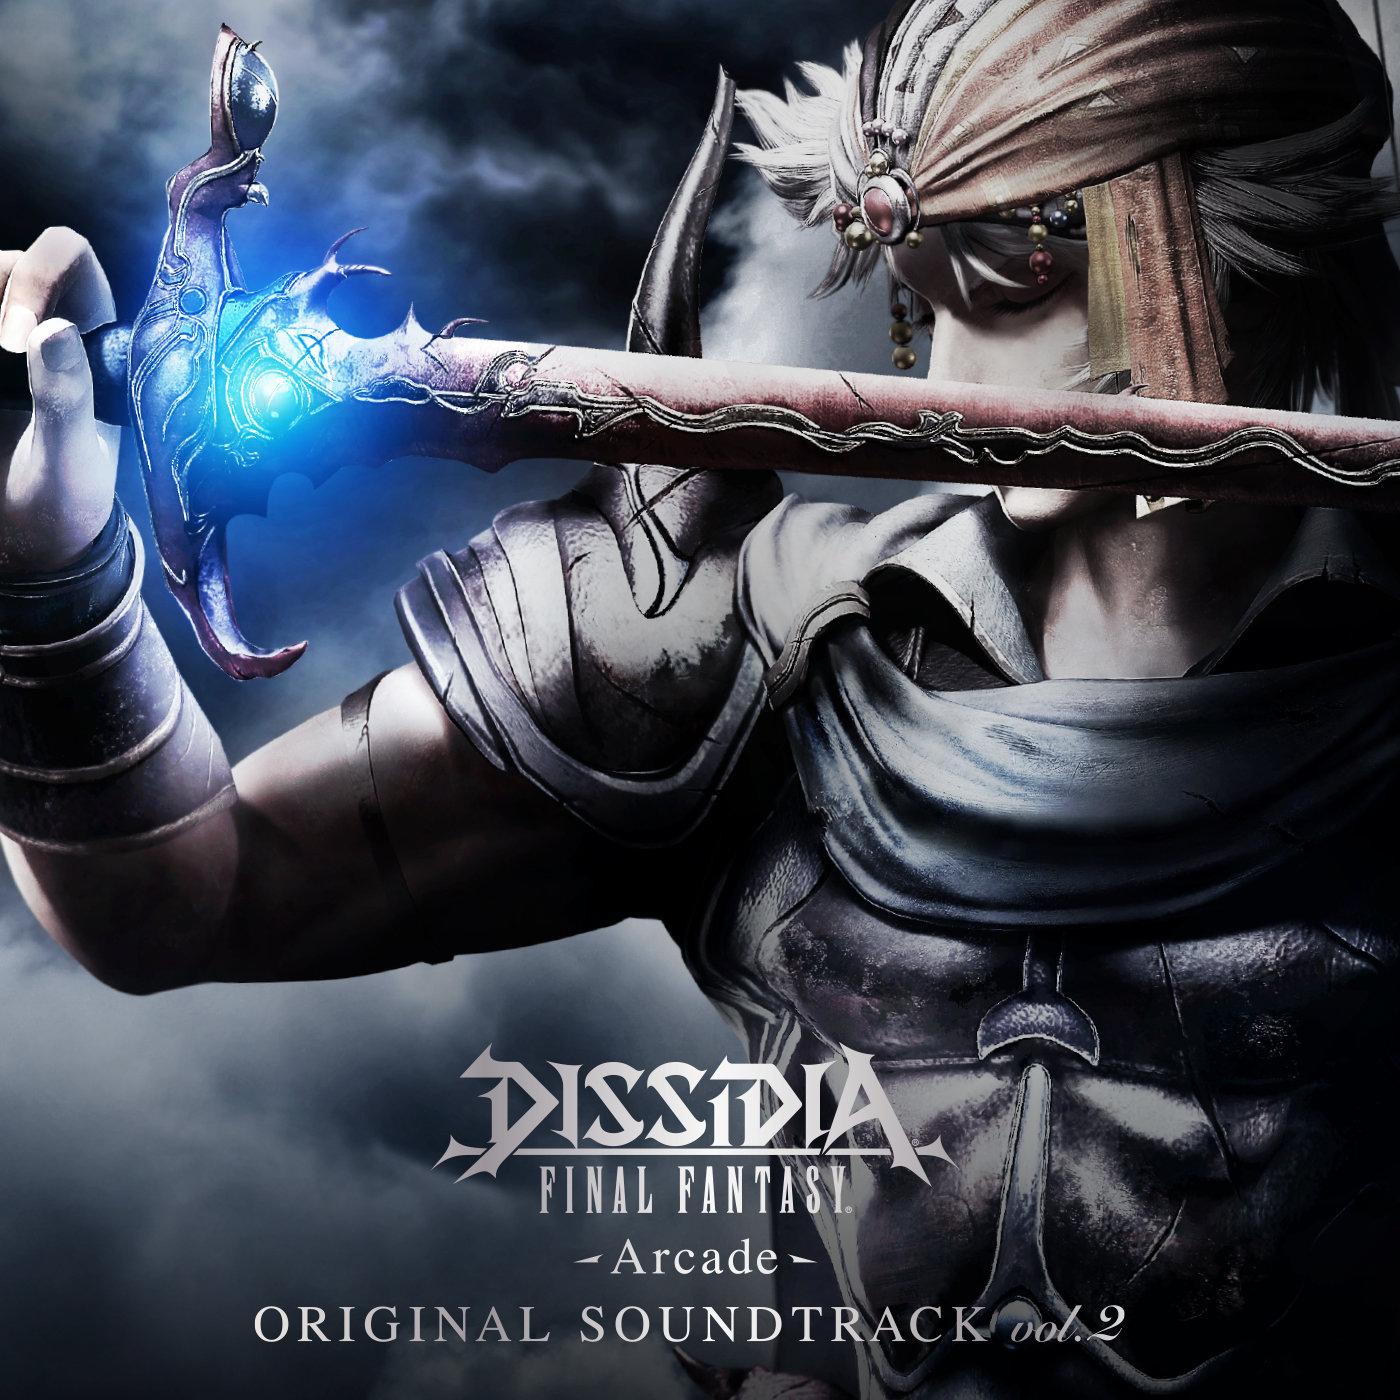 DISSIDIA FINAL FANTASY -Arcade- музыка из игры